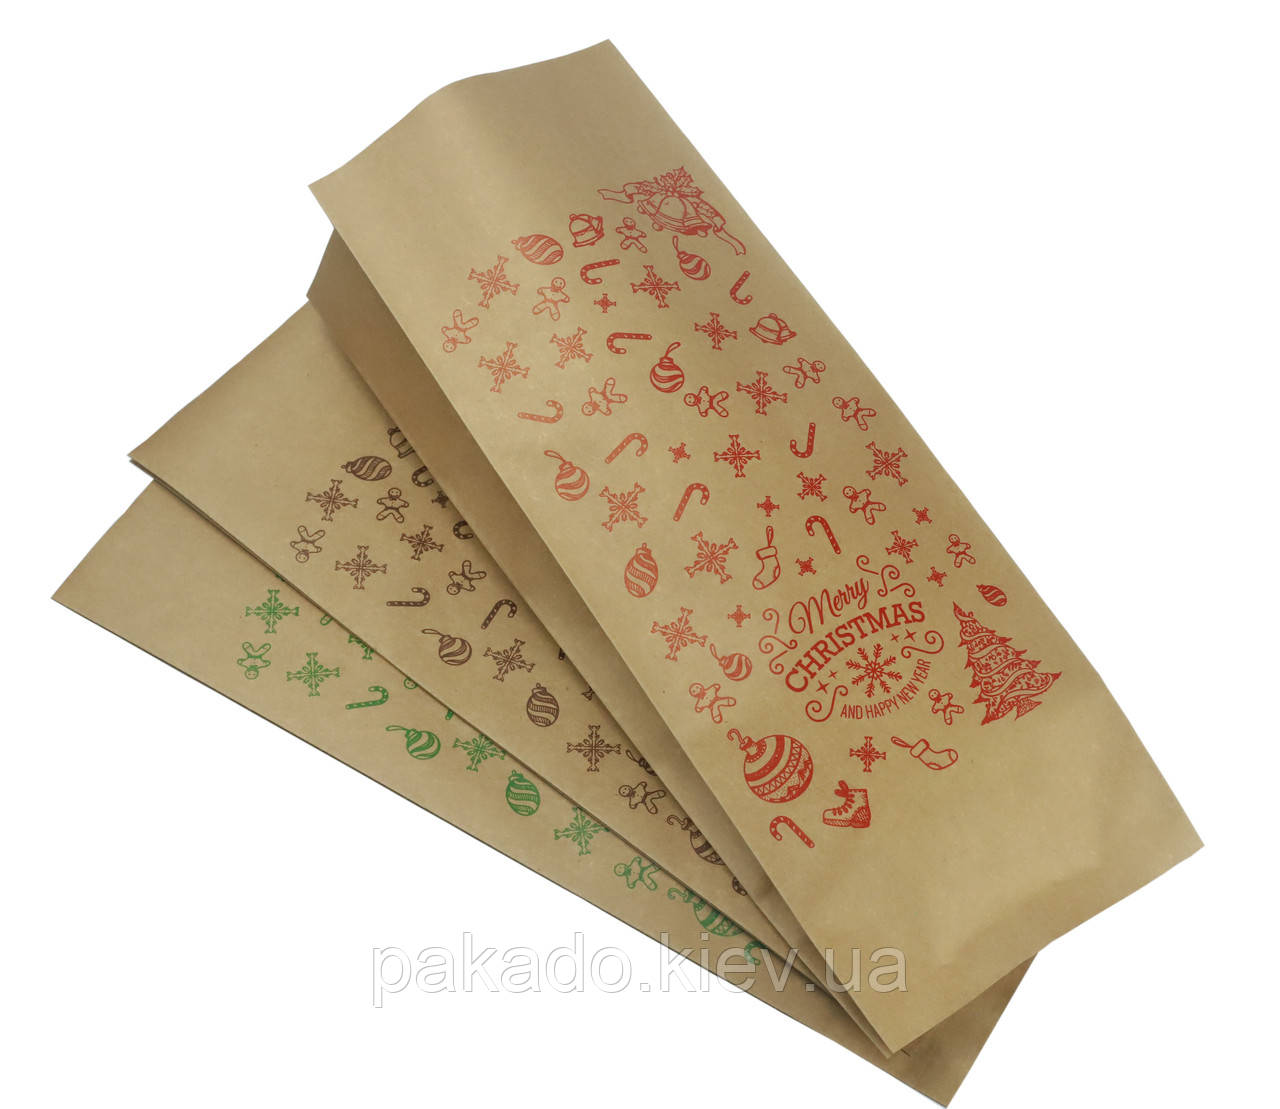 Пакет с центральным швом 135х360х35 (1кг) Крафт/Метал/Ре + рис. С новым годом (красный)